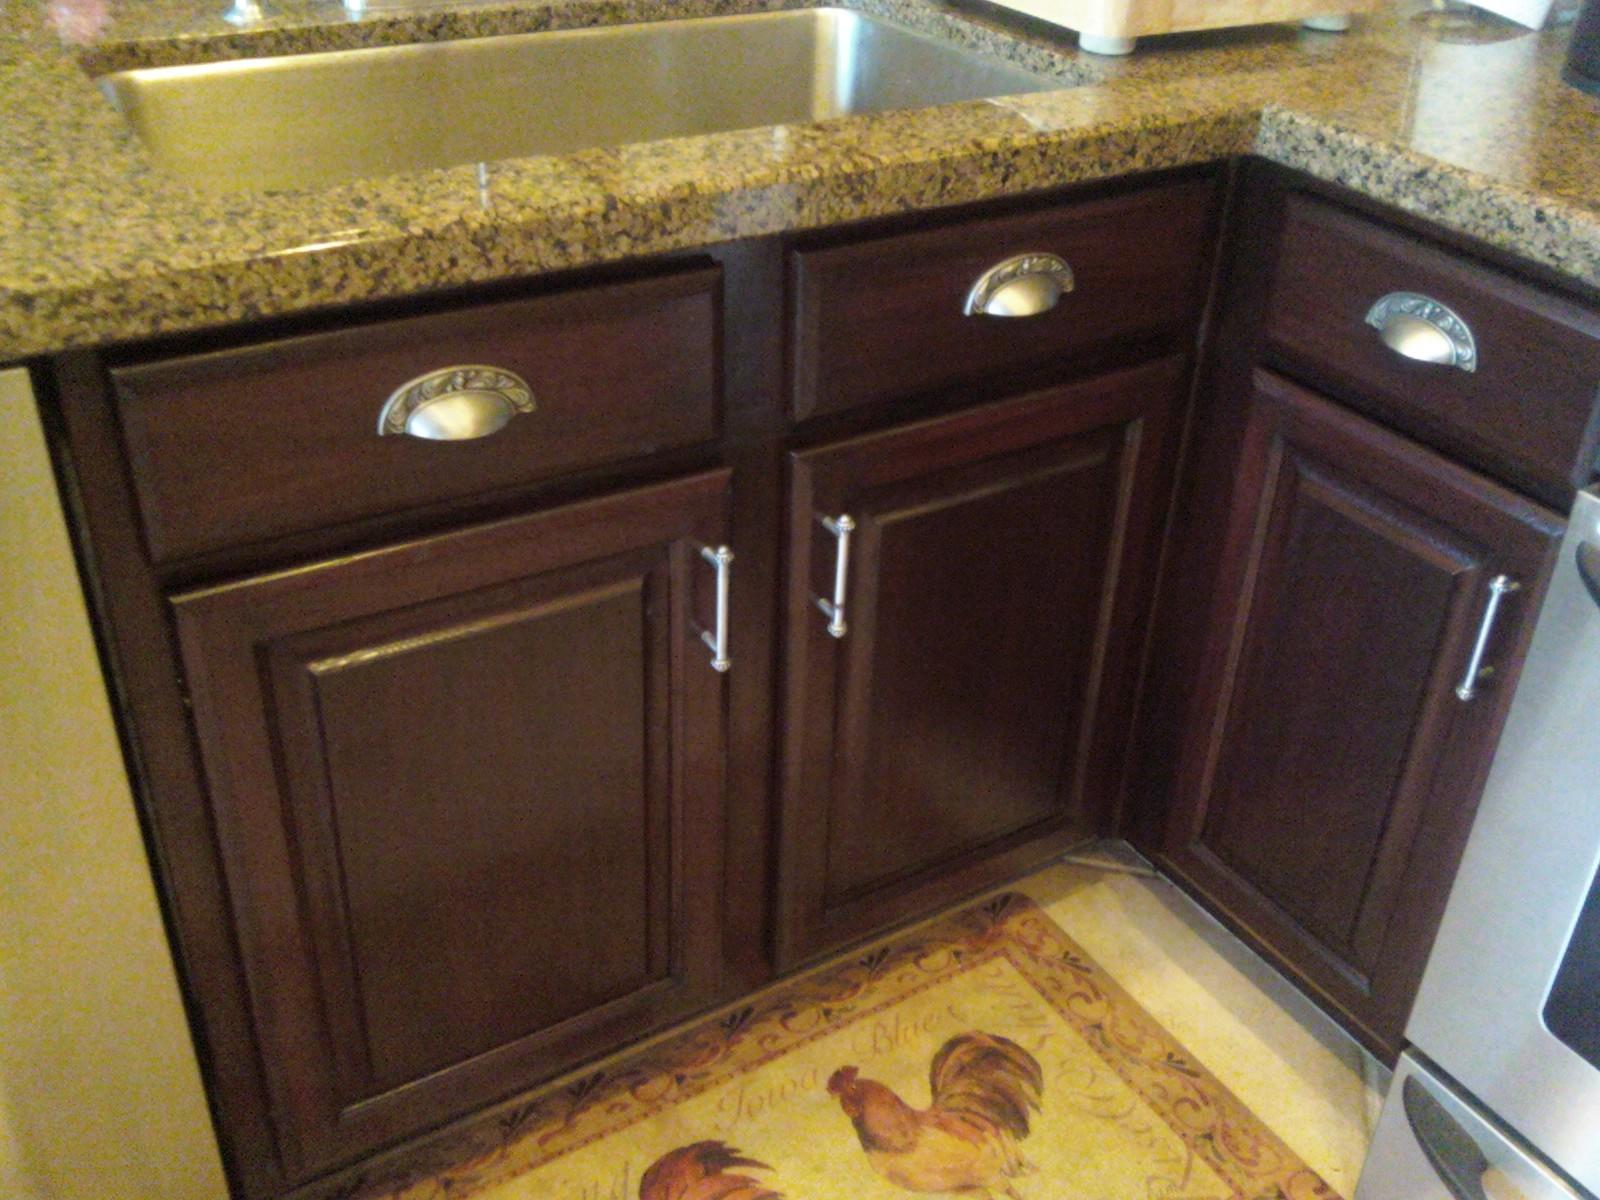 kitchen cabinets 3 staining kitchen cabinets Kitchen cabinets After custom staining